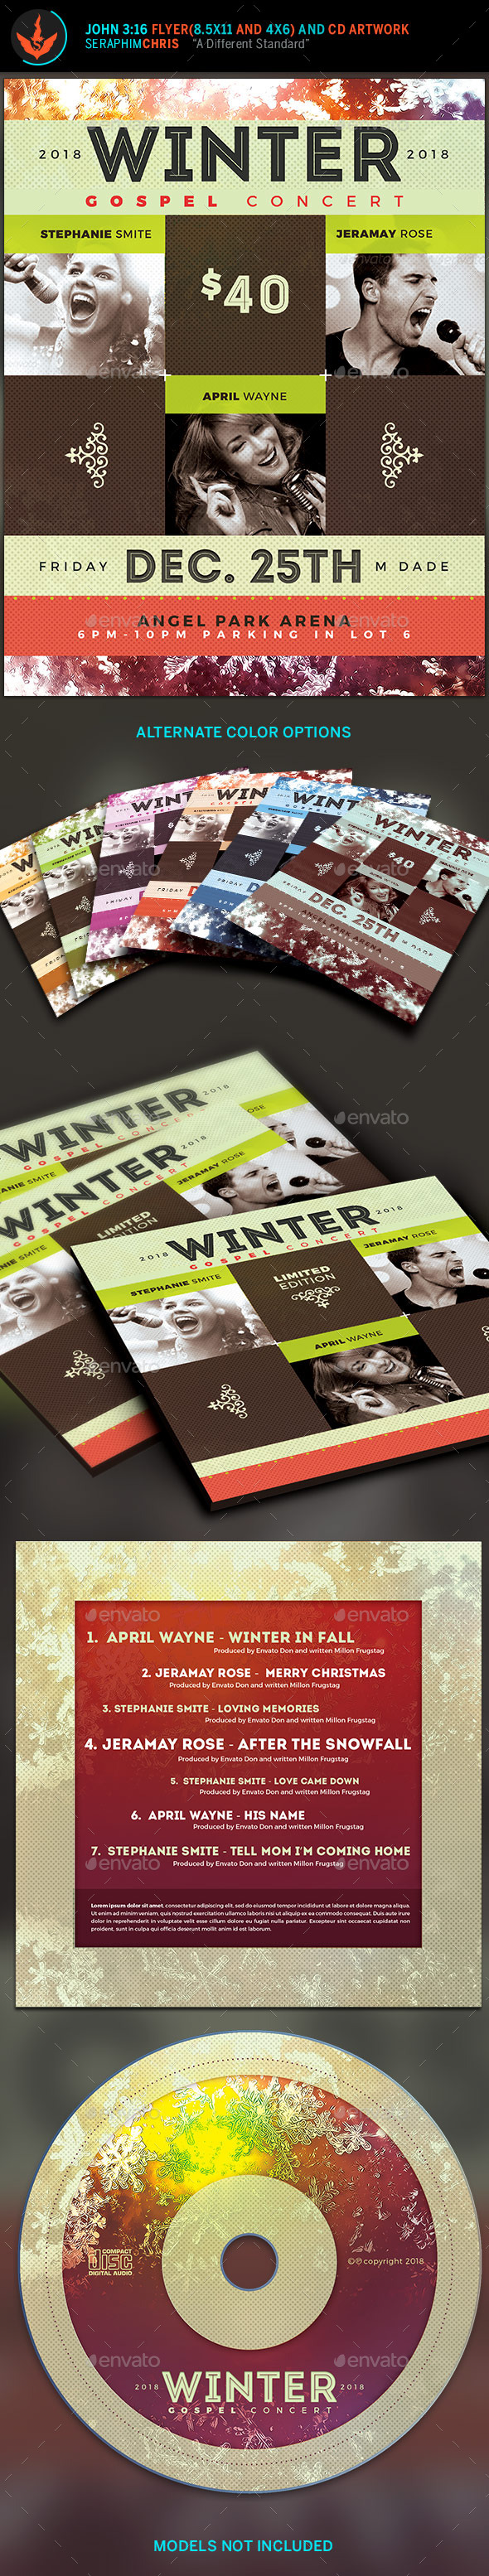 Winter Spring Gospel Concert Flyer - Church Flyers